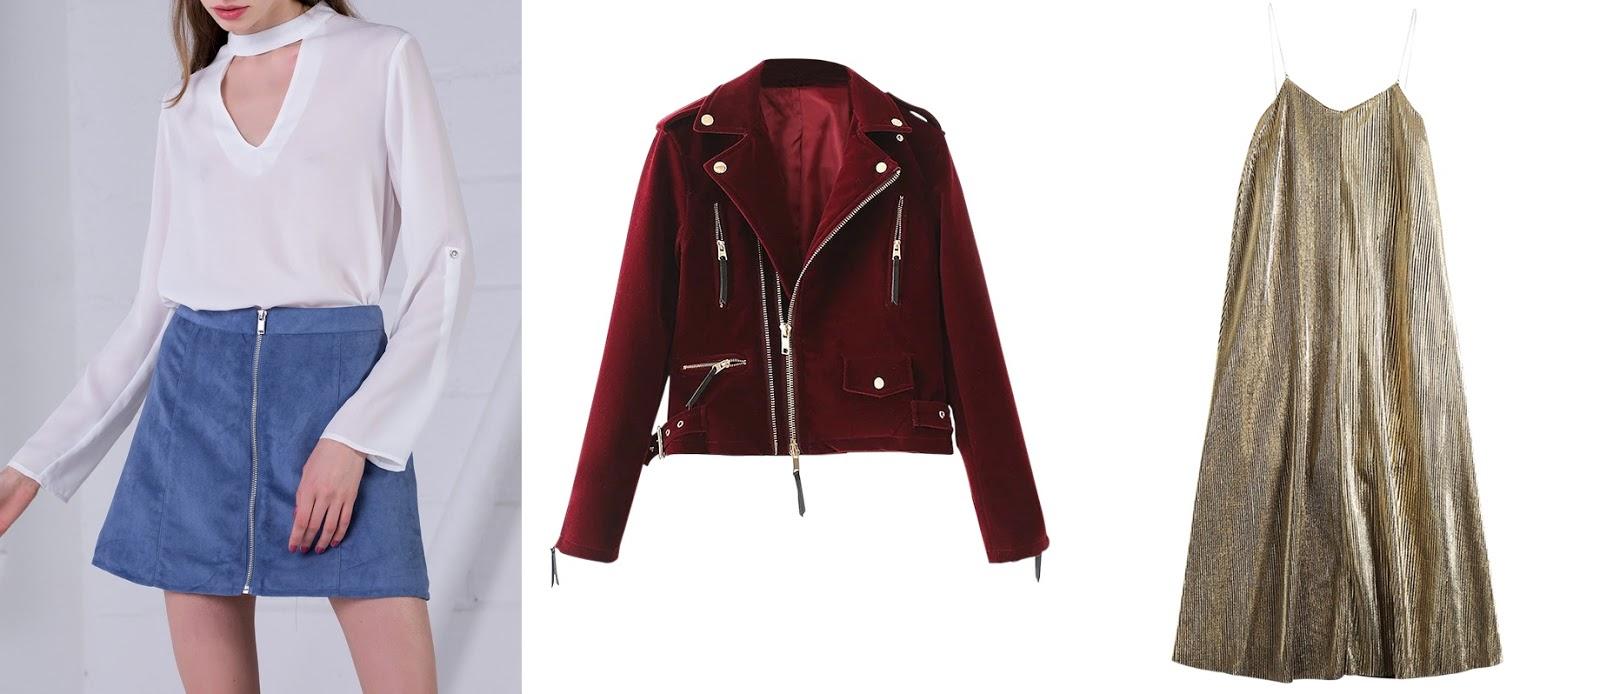 zaful - online fashion store, chiffon blouse, velvet biker jacket, glittered midi dress, wishlist